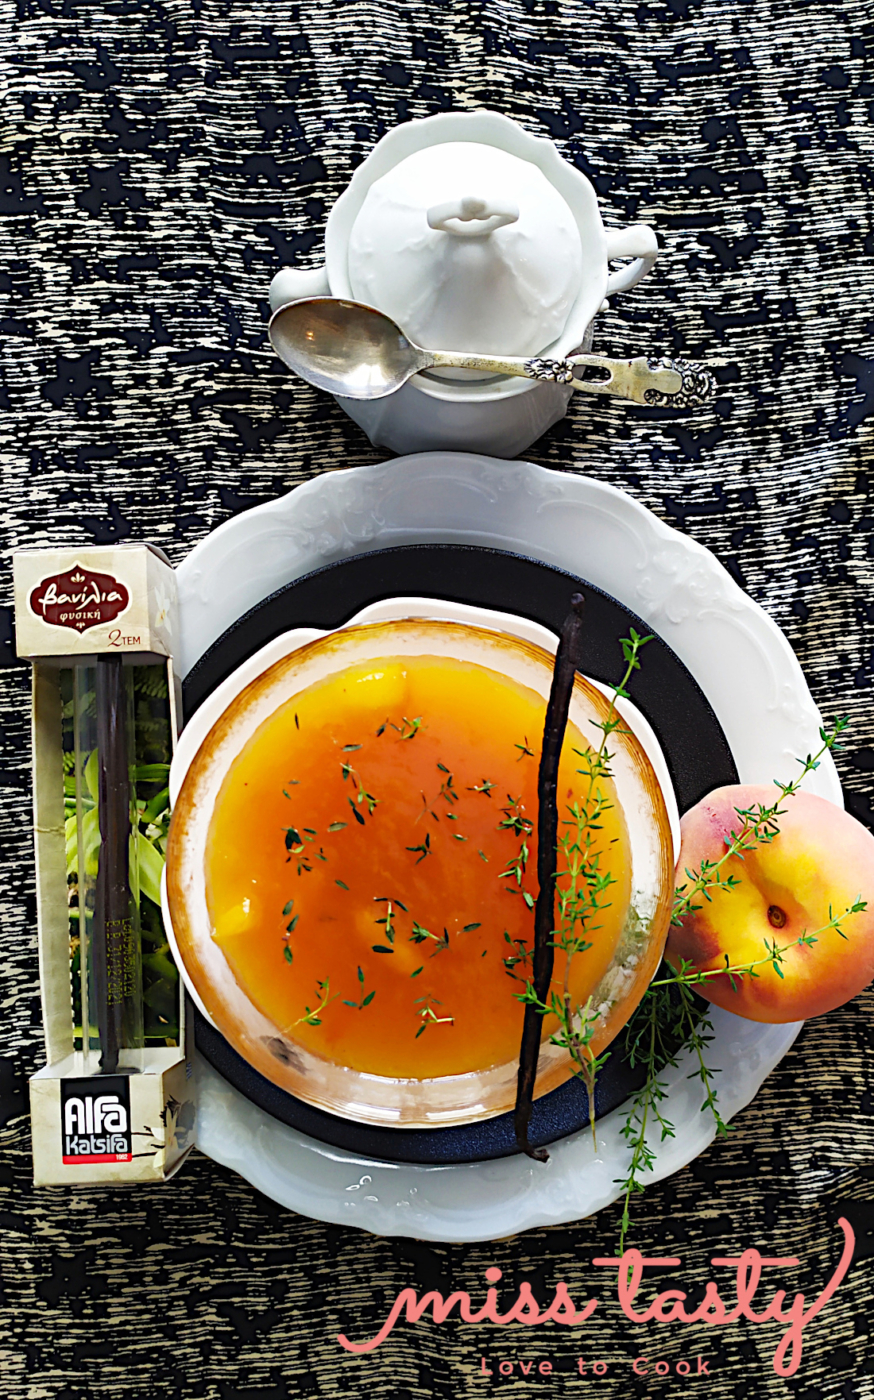 Marmelada-rodakino-banilia-thumari-4